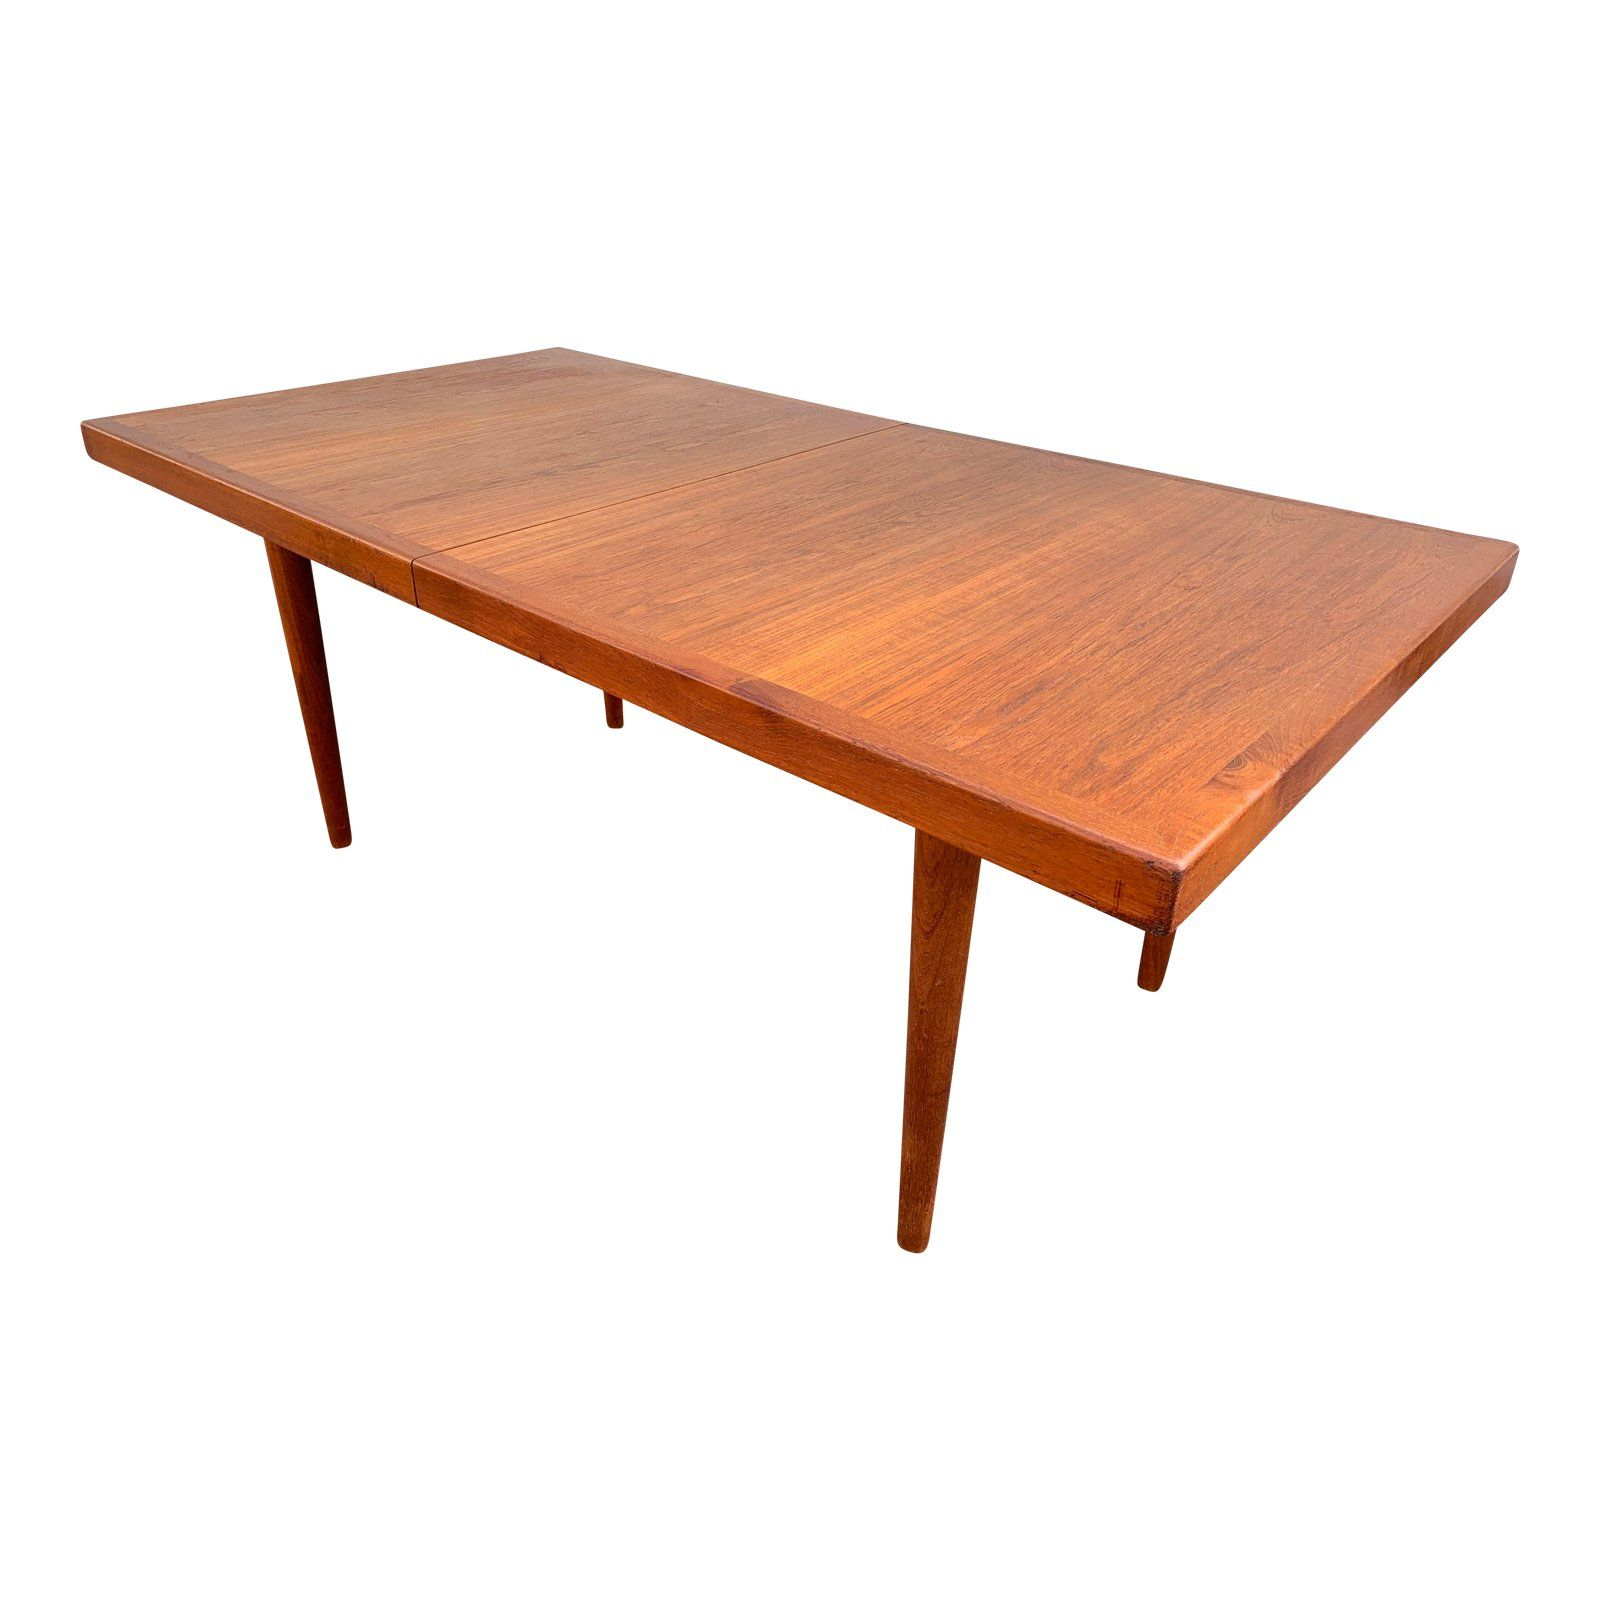 1960s Danish Modern Teak Dining Table For Sale With Images Dining Table Mid Century Modern Dining Room Table Mid Century Modern Dining Room